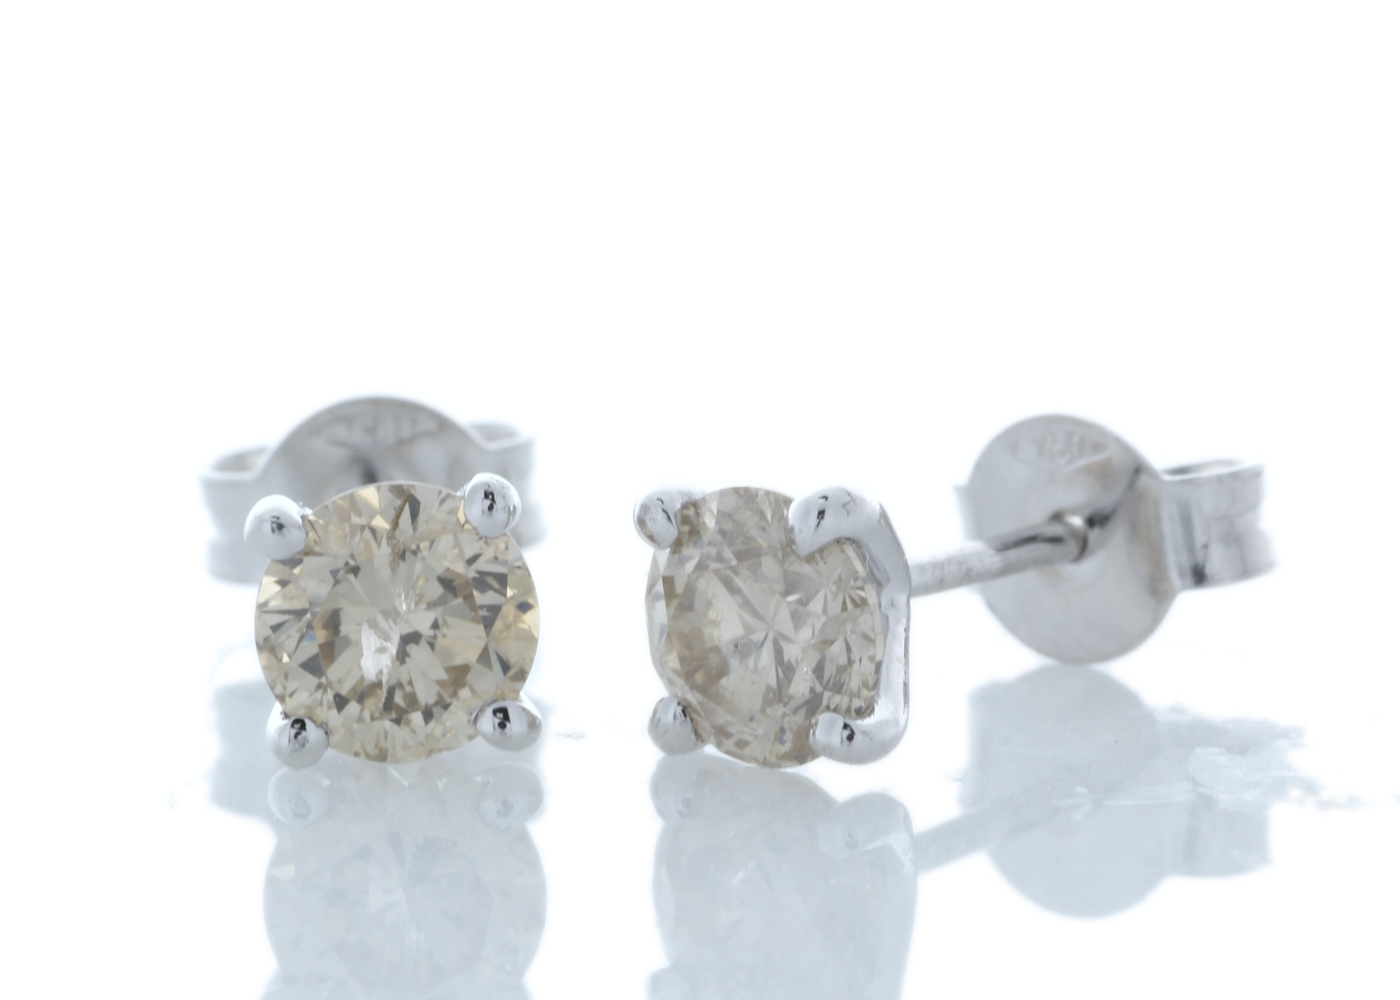 18ct White Gold Prong Set Diamond Earrings 1.22 Carats - Image 2 of 3